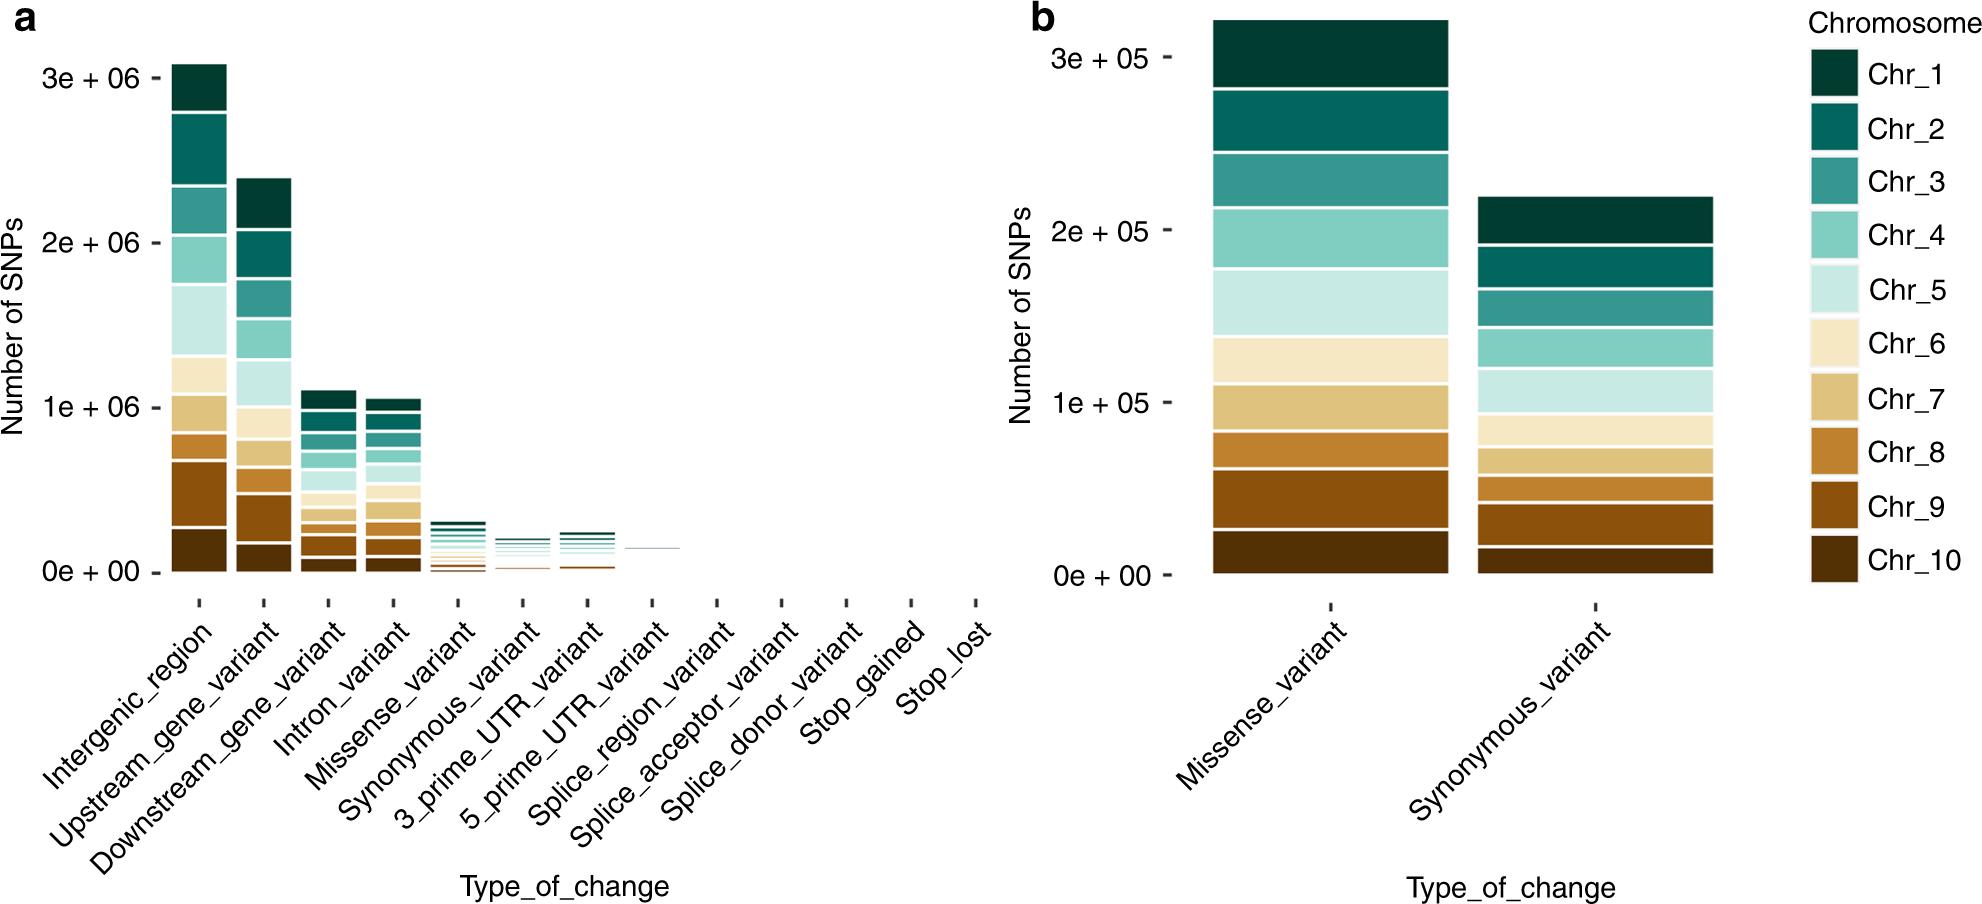 8e2e70509c30 Population genomic analyses of the chocolate tree